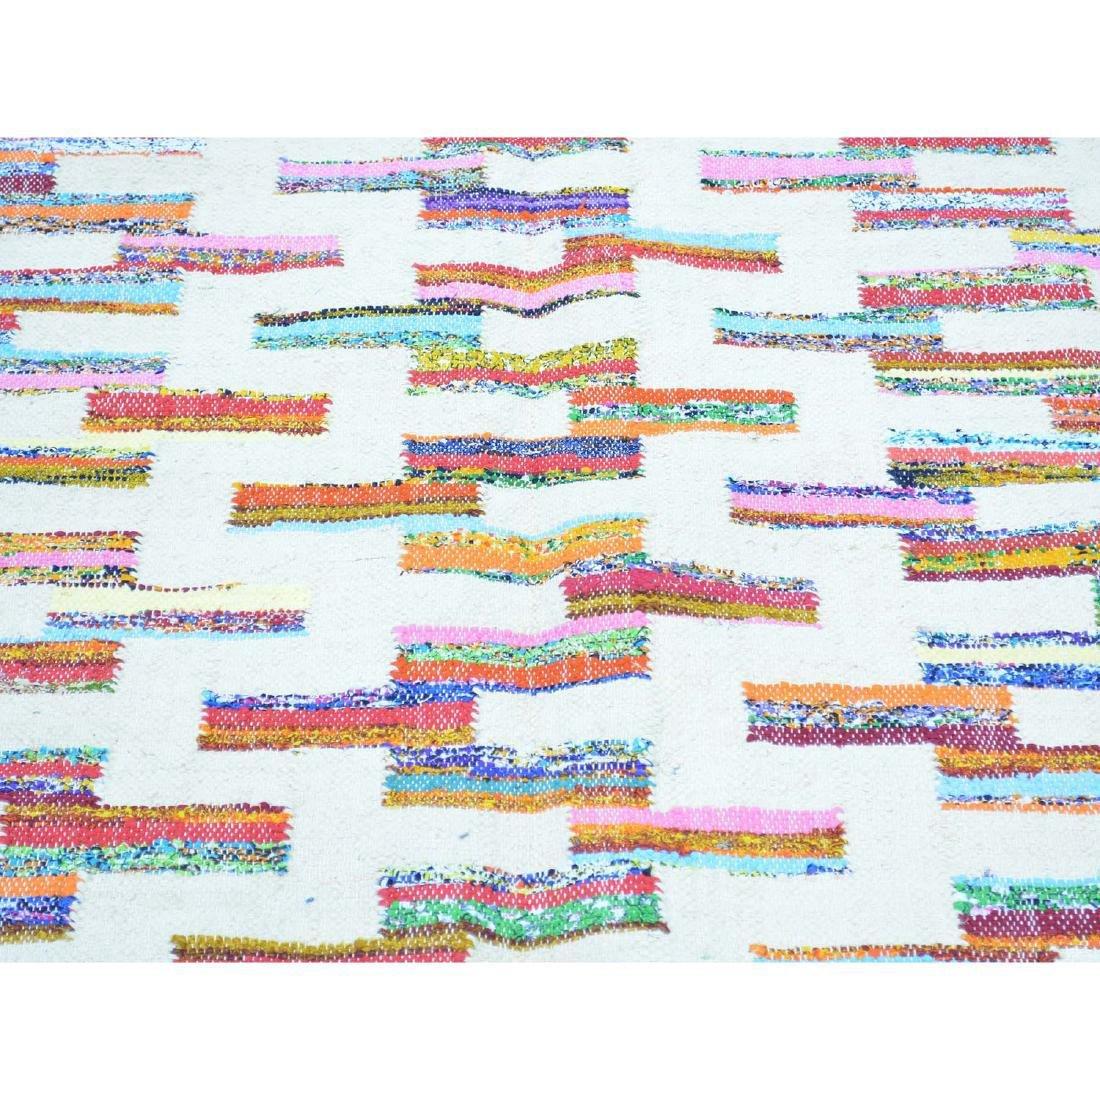 Cotton Sari Silk Flat Weave Kilim Hand Woven Rug 5.x7.1 - 4